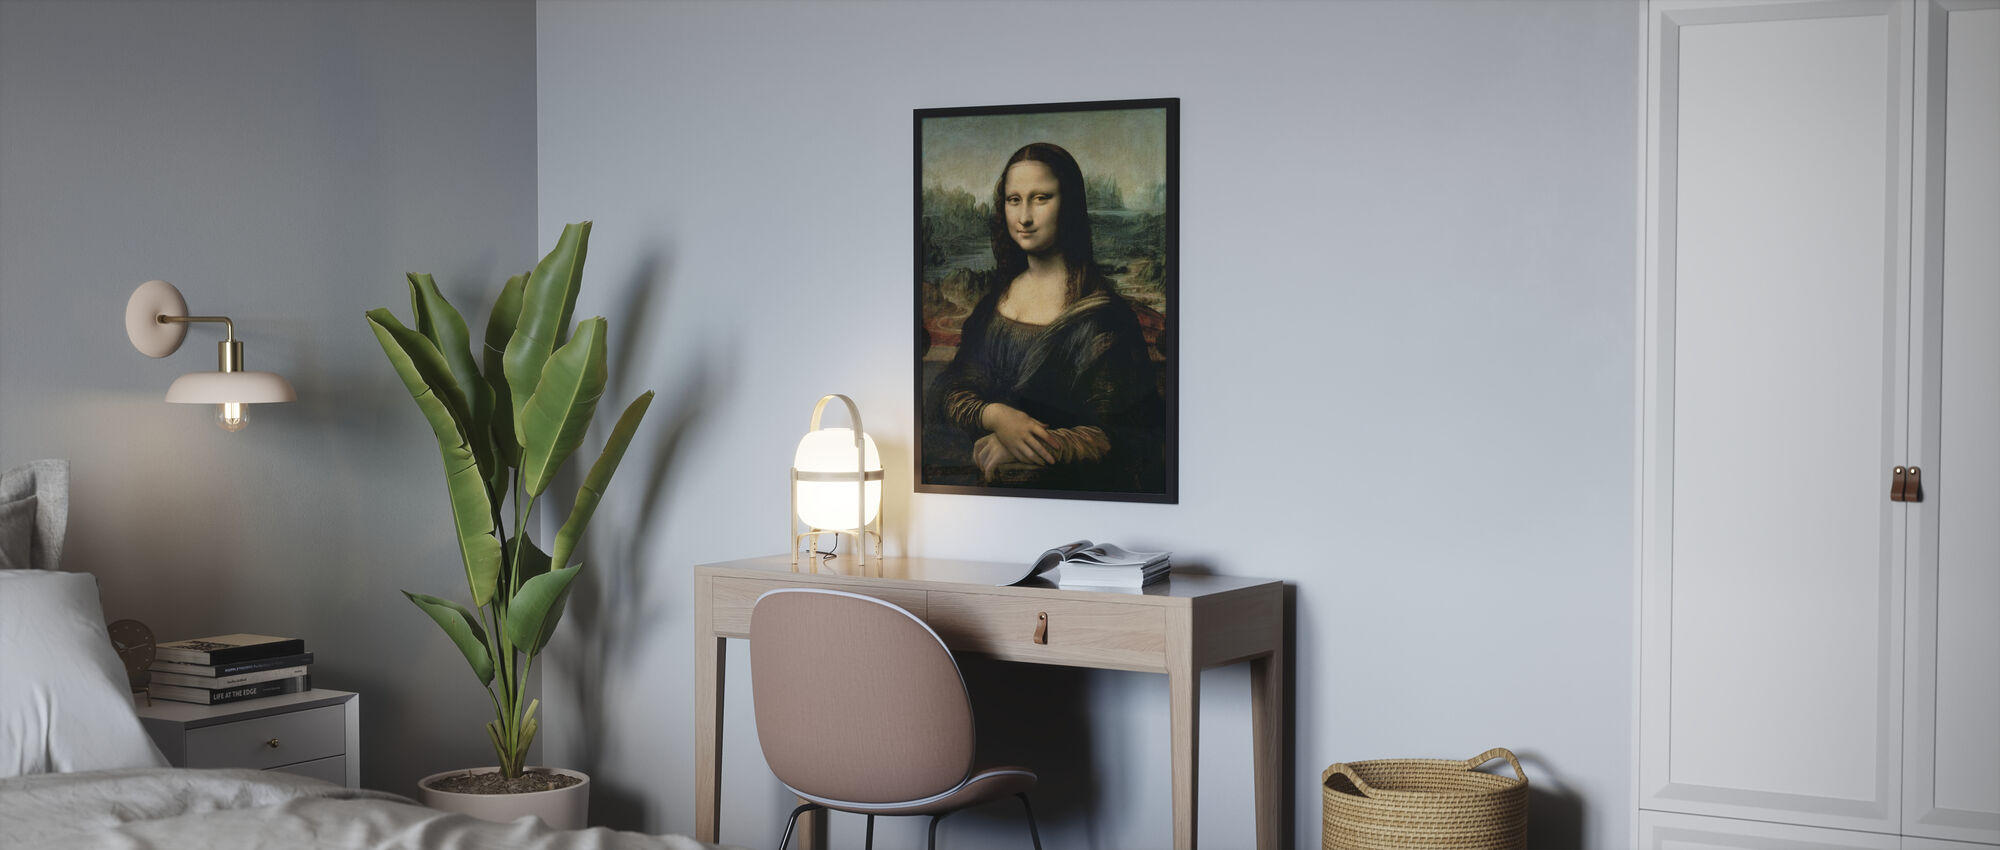 Mona Lisa, Leonardo da Vinci - Poster - Schlafzimmer